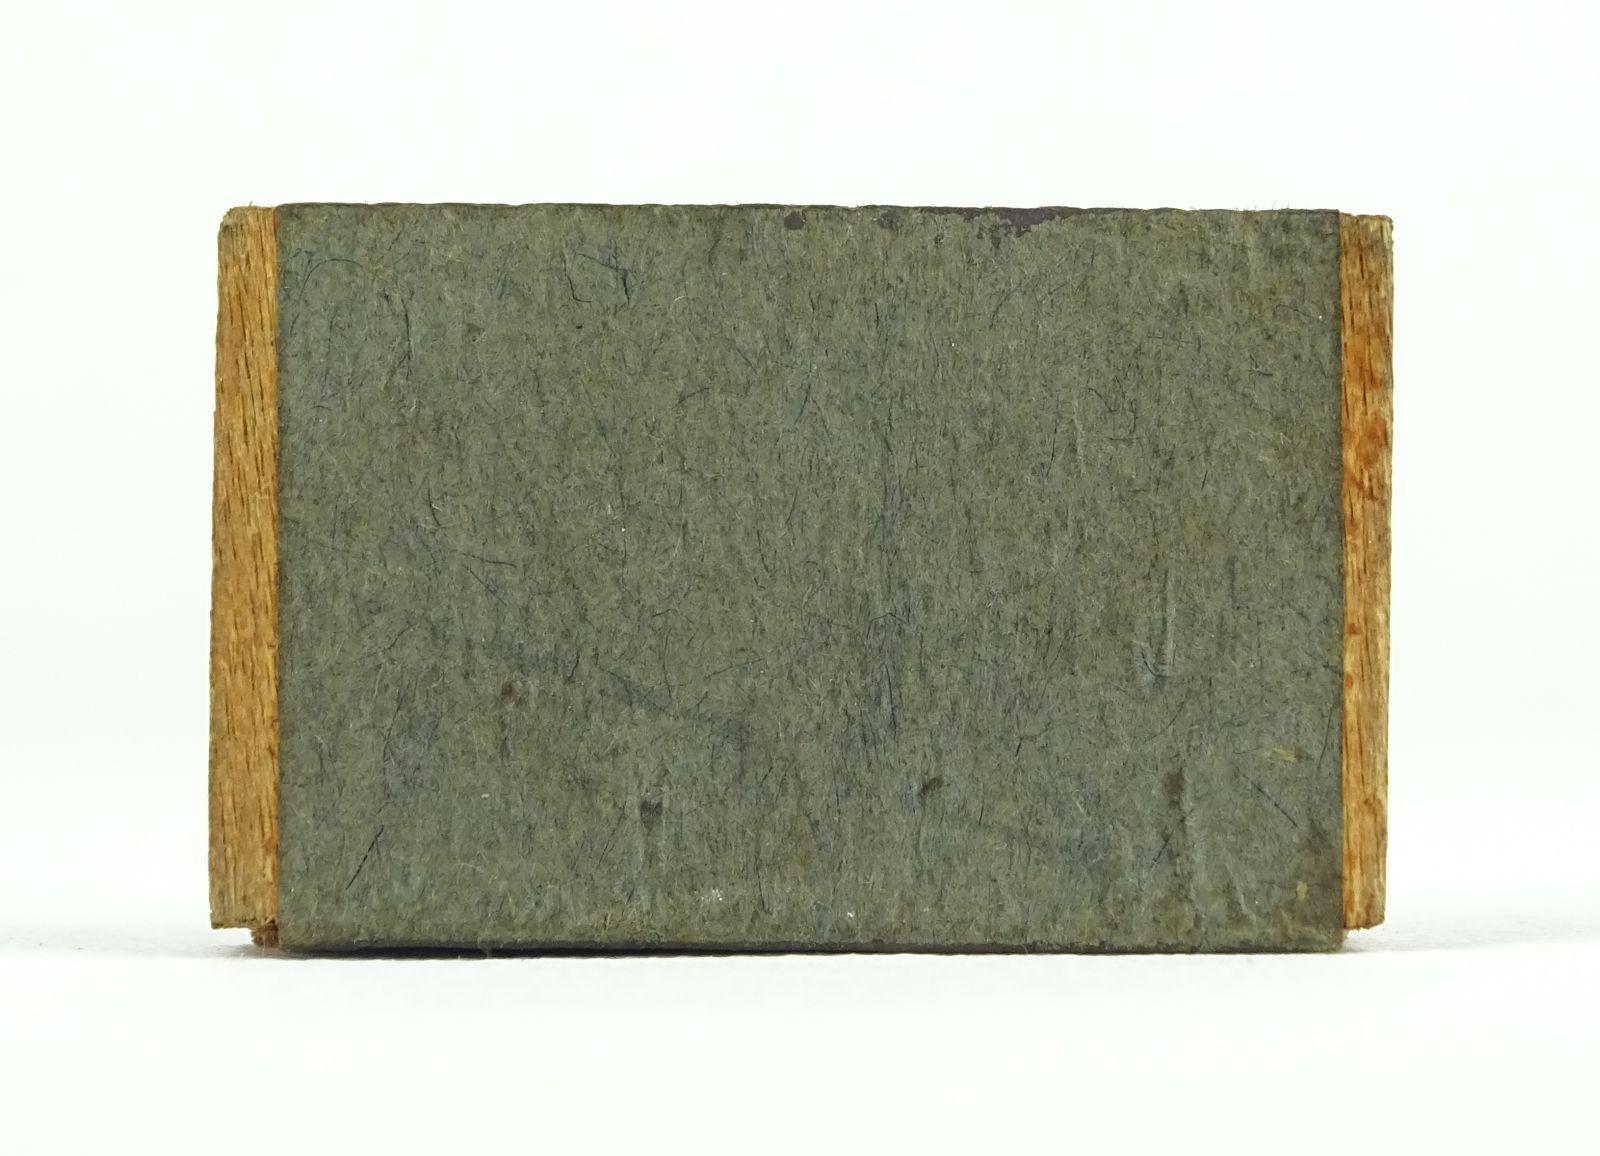 DSC02260.JPG (1600×1156)